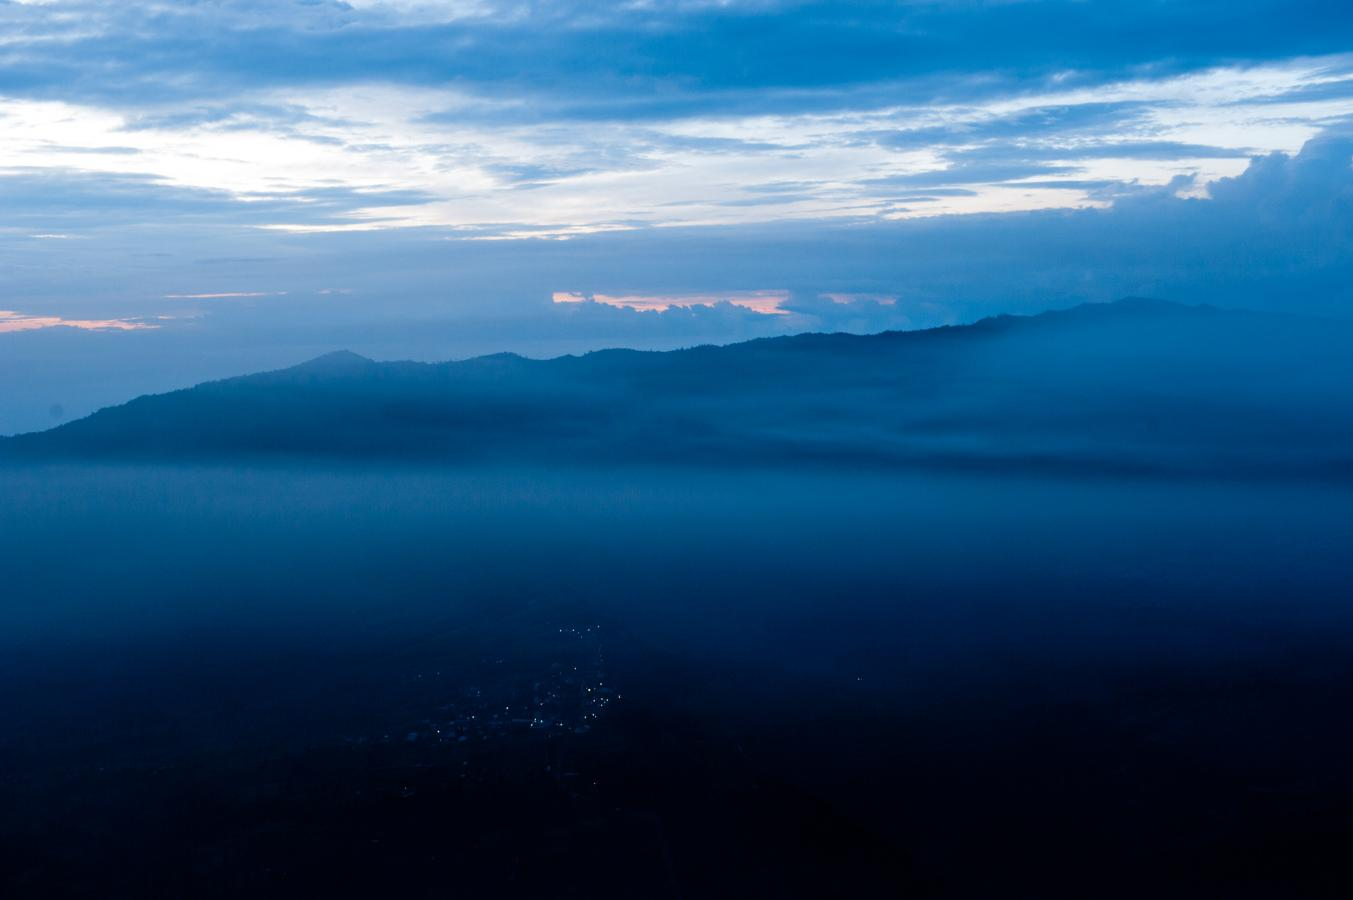 sunrise-at-the-bromo-volcano-java-2010